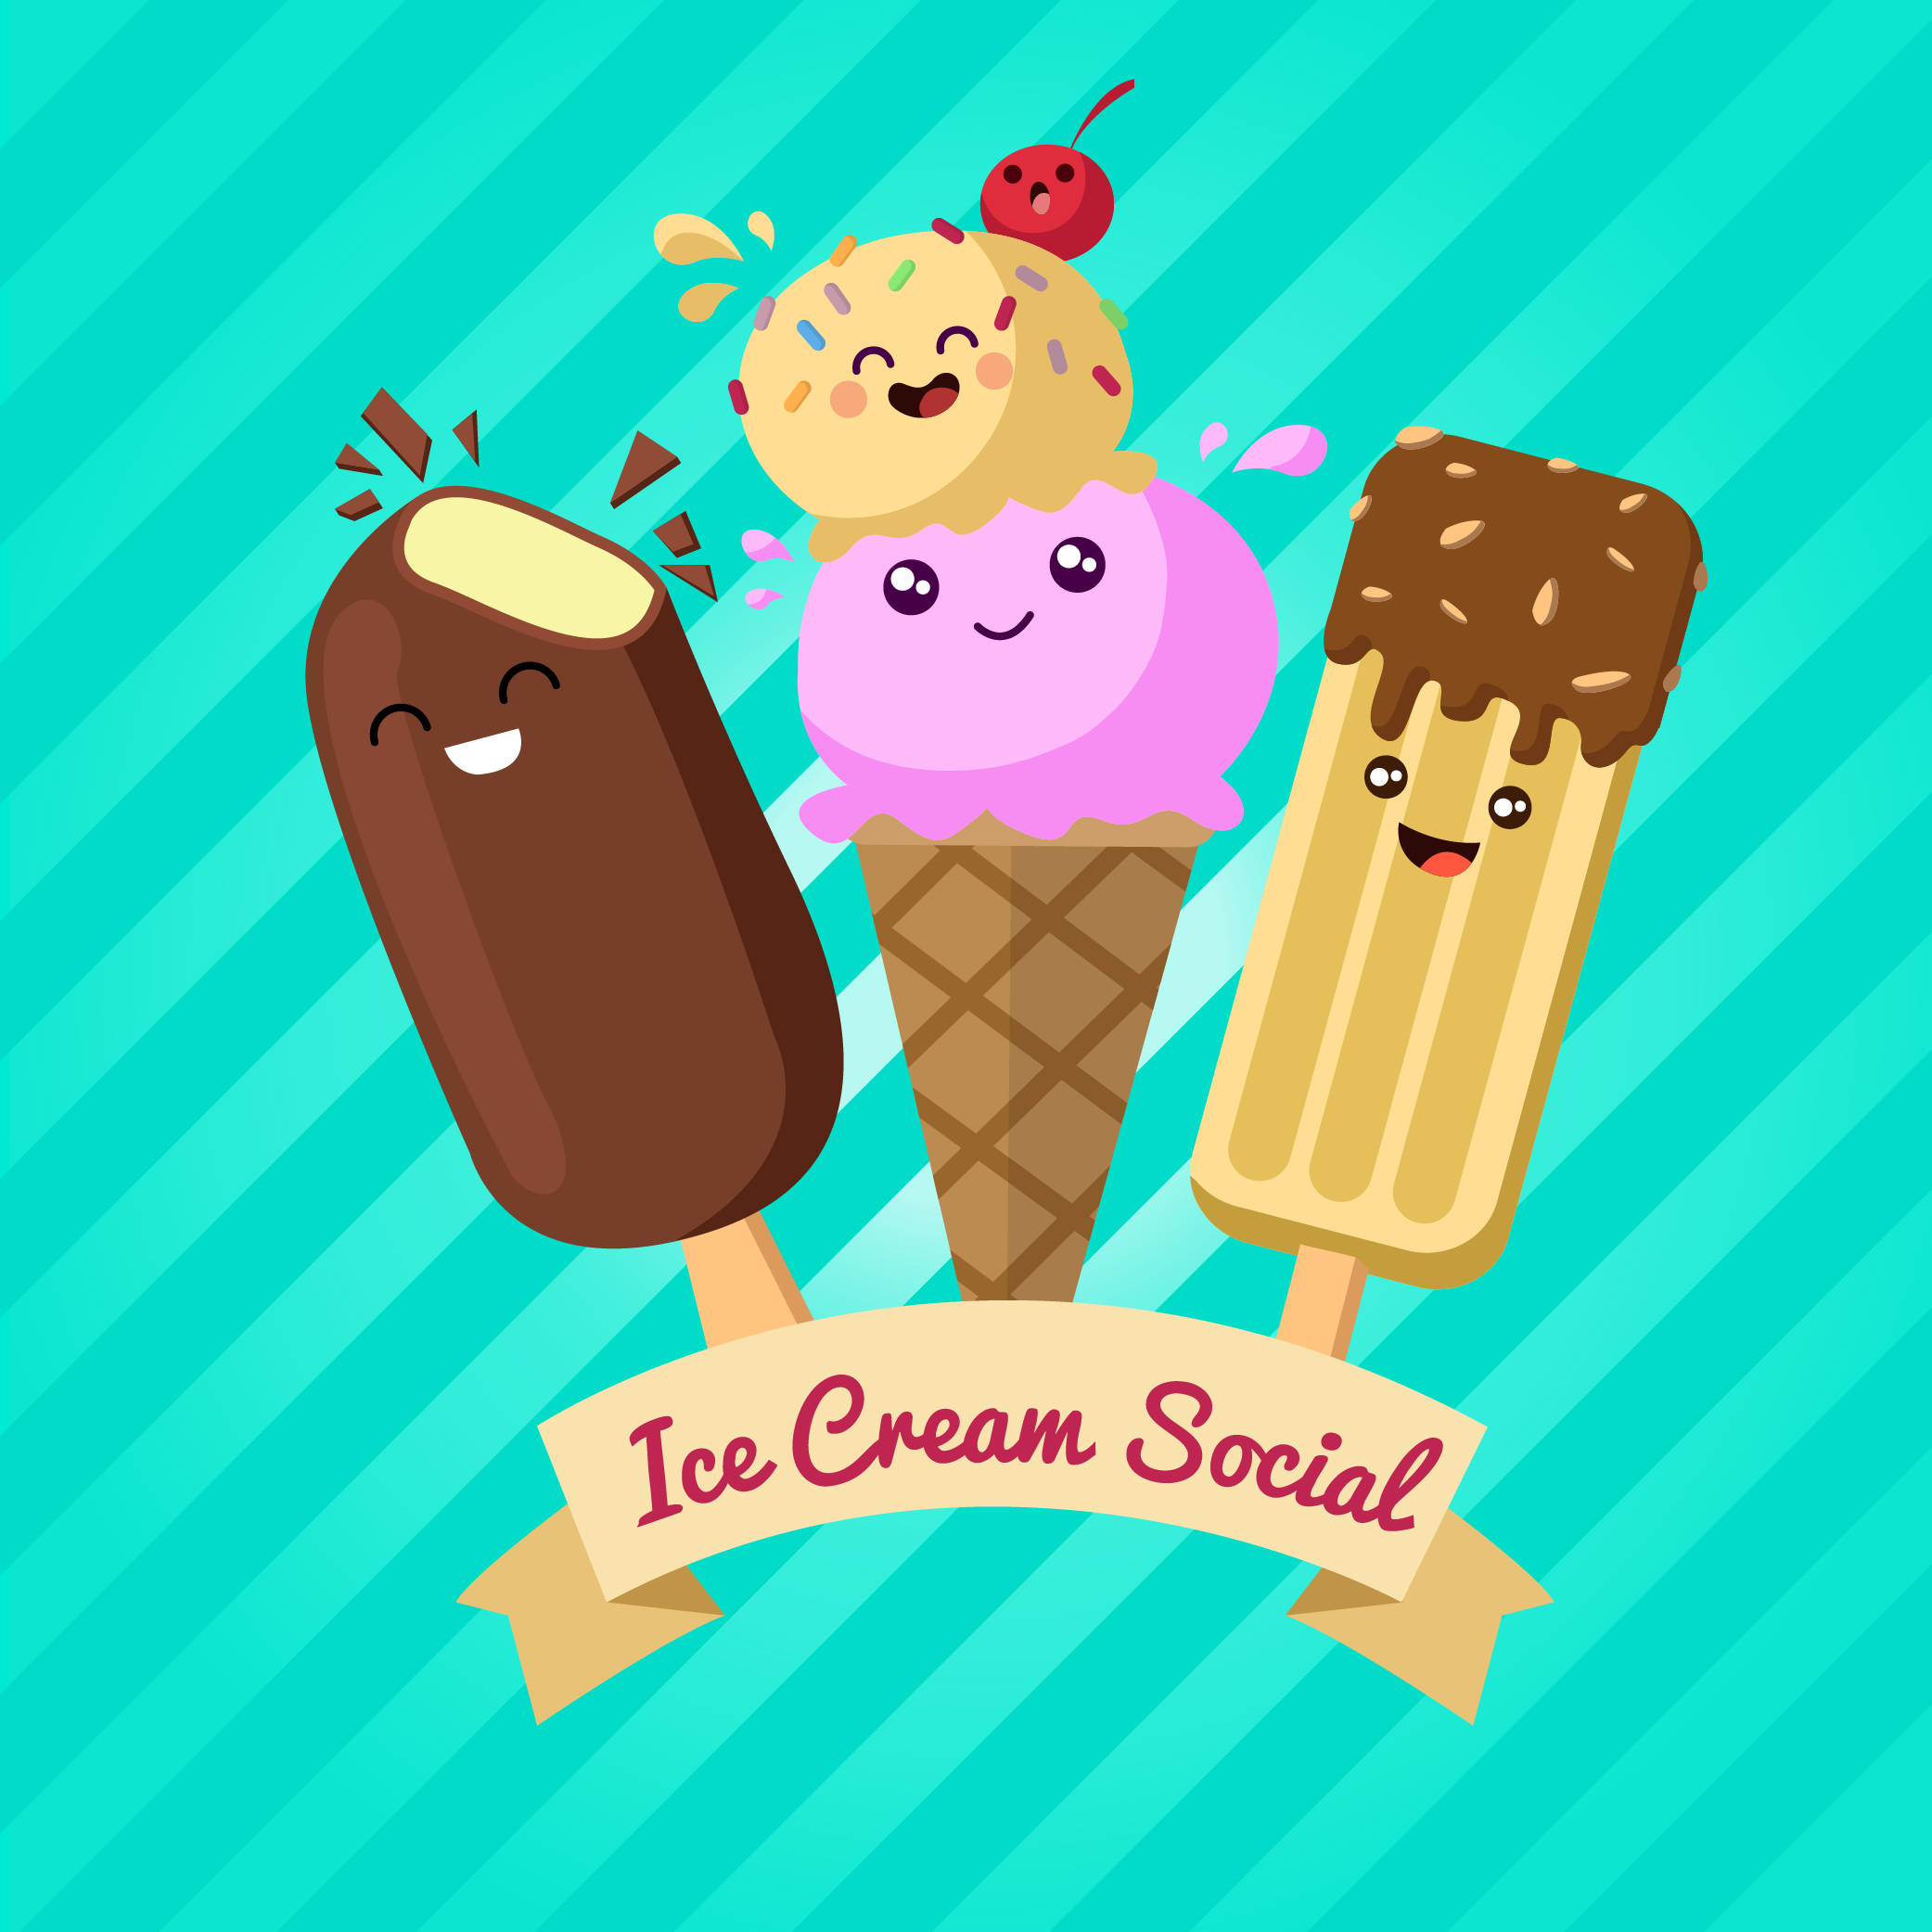 carag-ice-cream-social-image